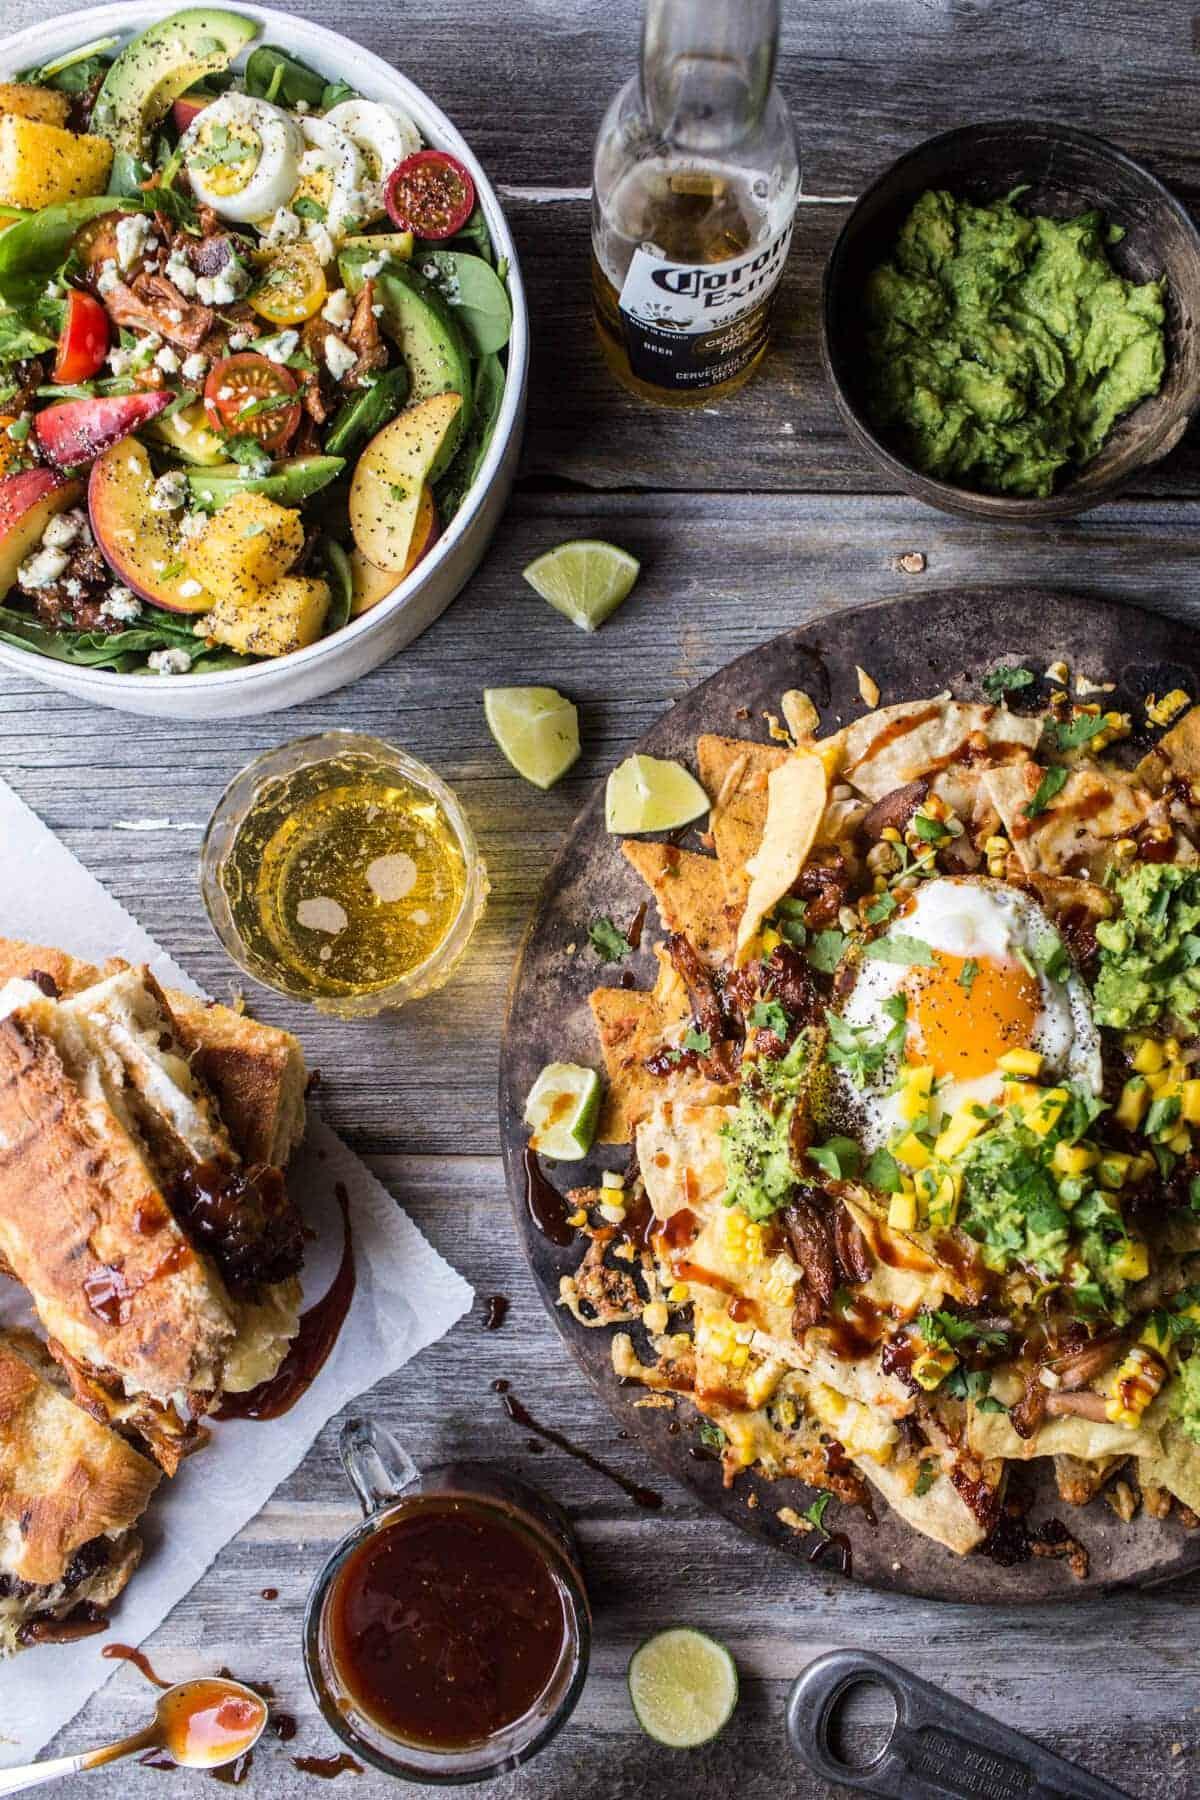 Leftover Summer BBQ Recipes 3 Ways | halfbakedharvest.com @hbharvest